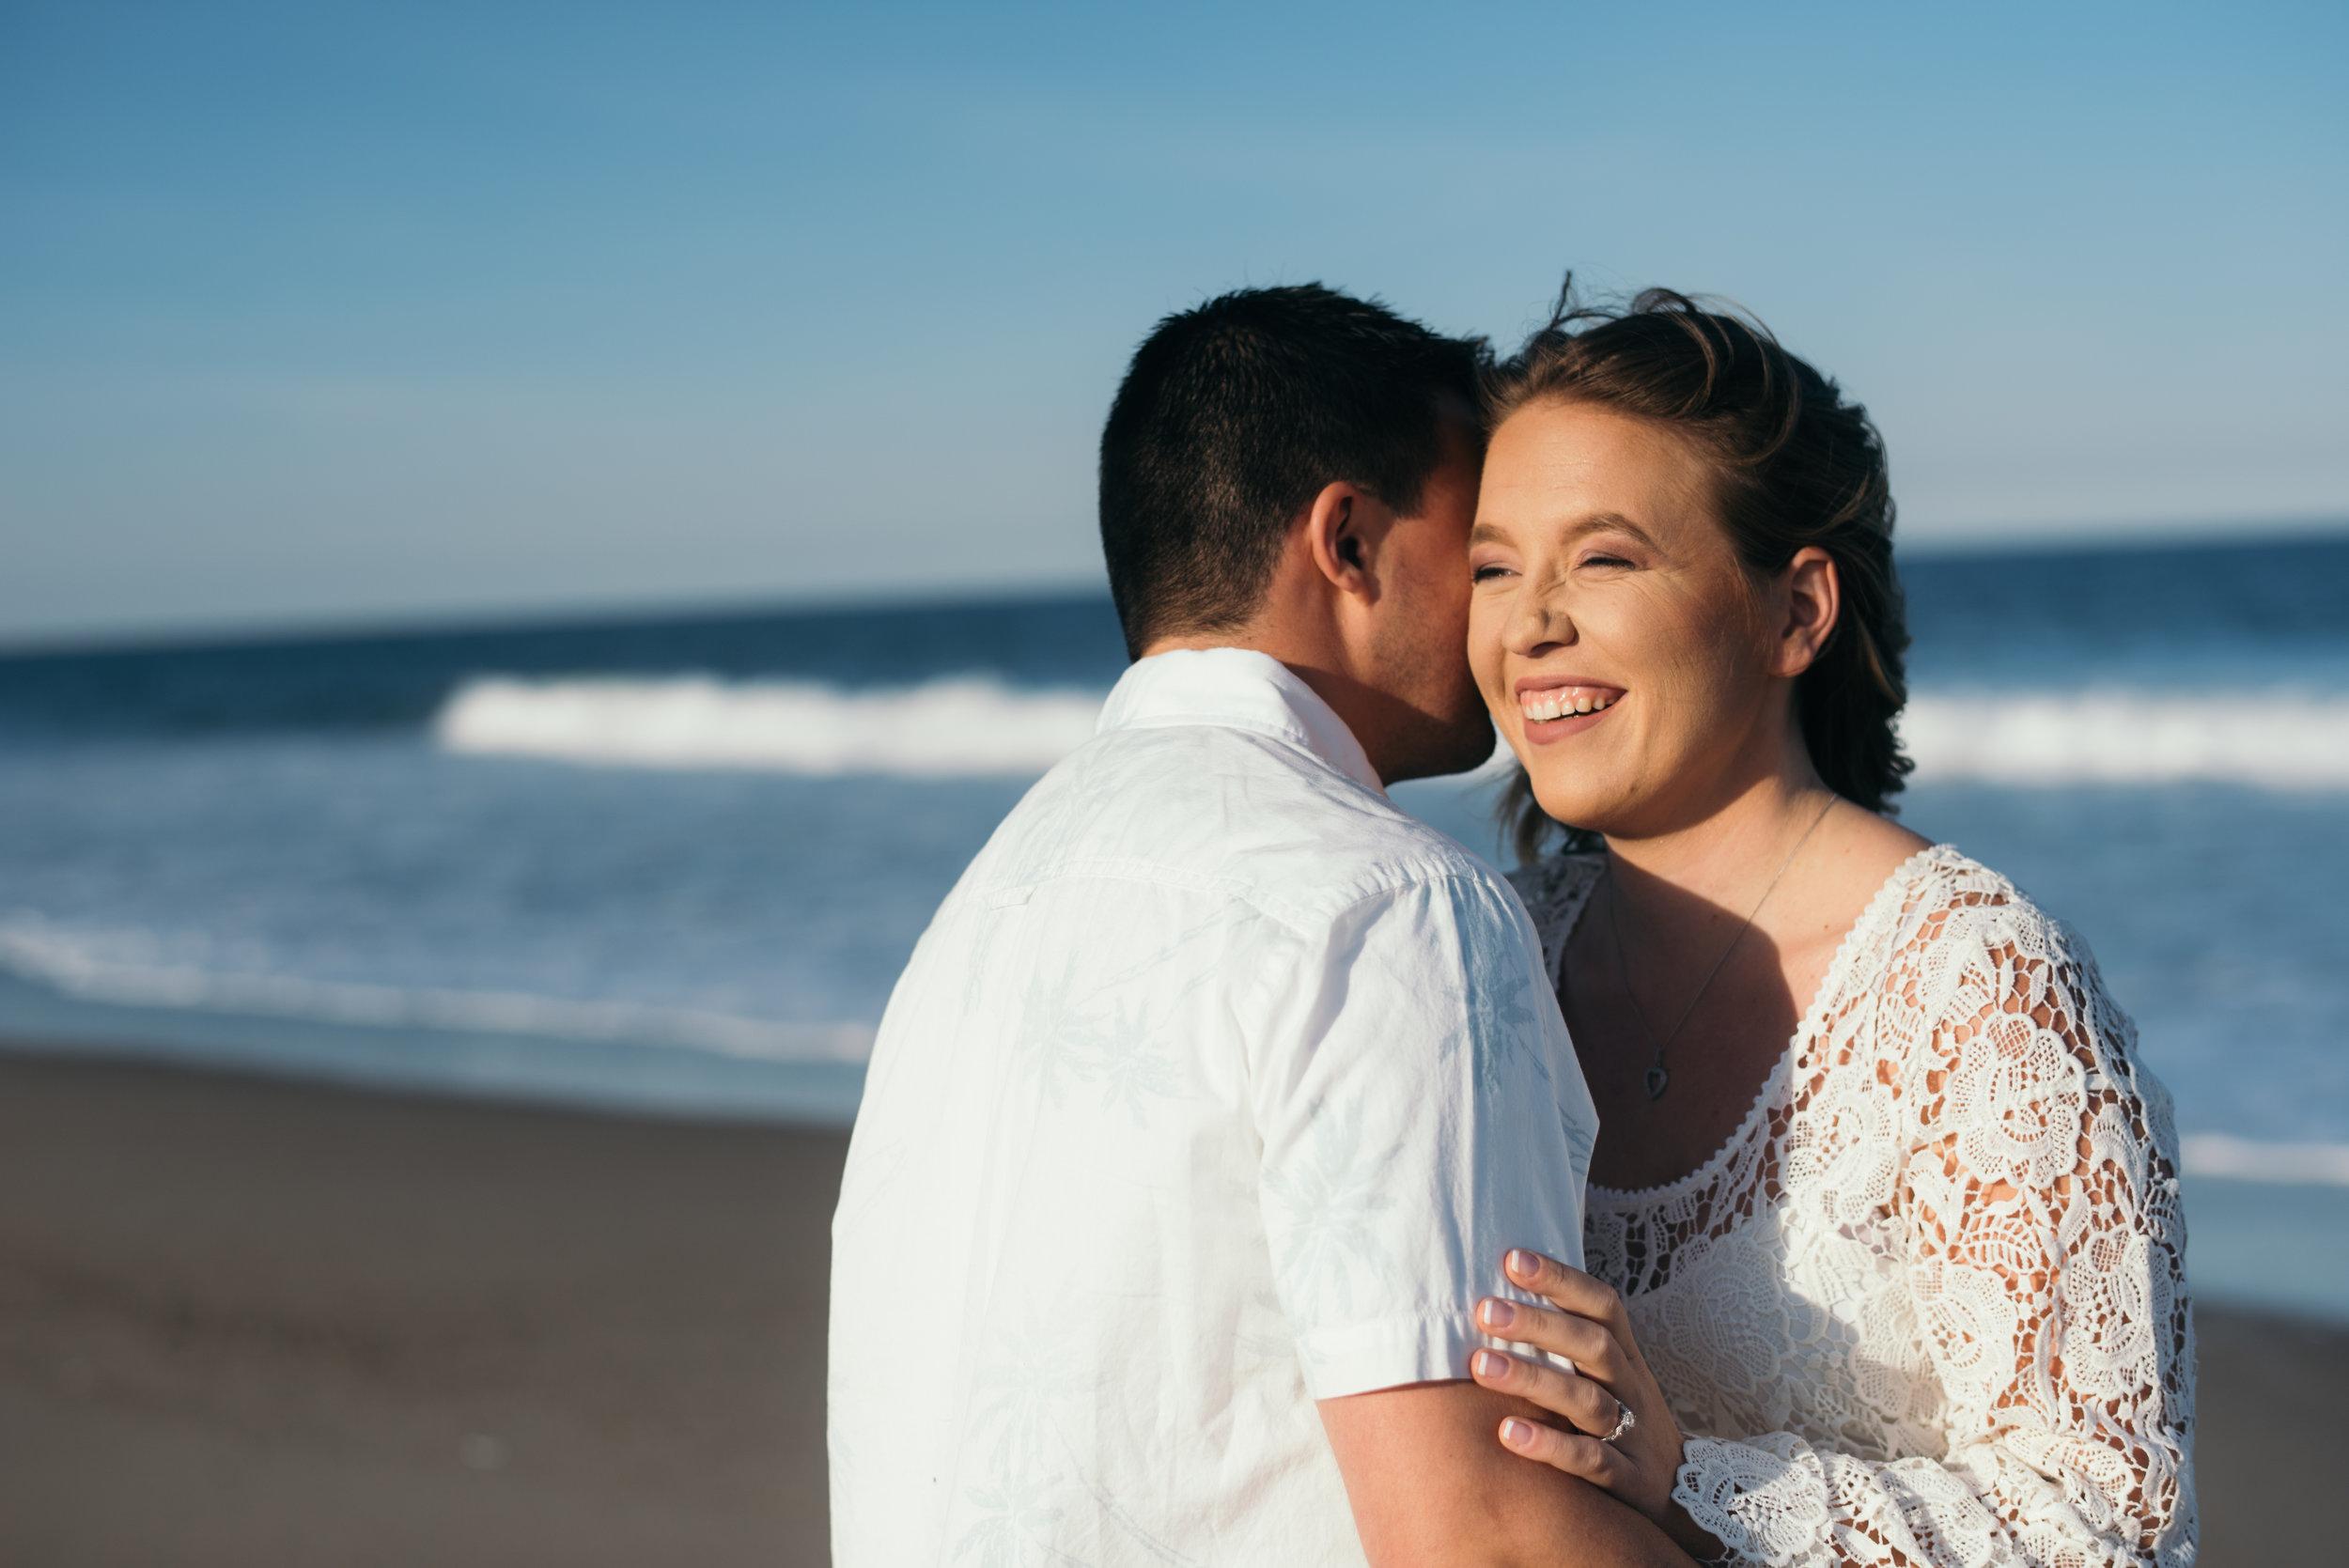 WeddingPhotos | NJPhotographer | Highlights-1-73.jpg